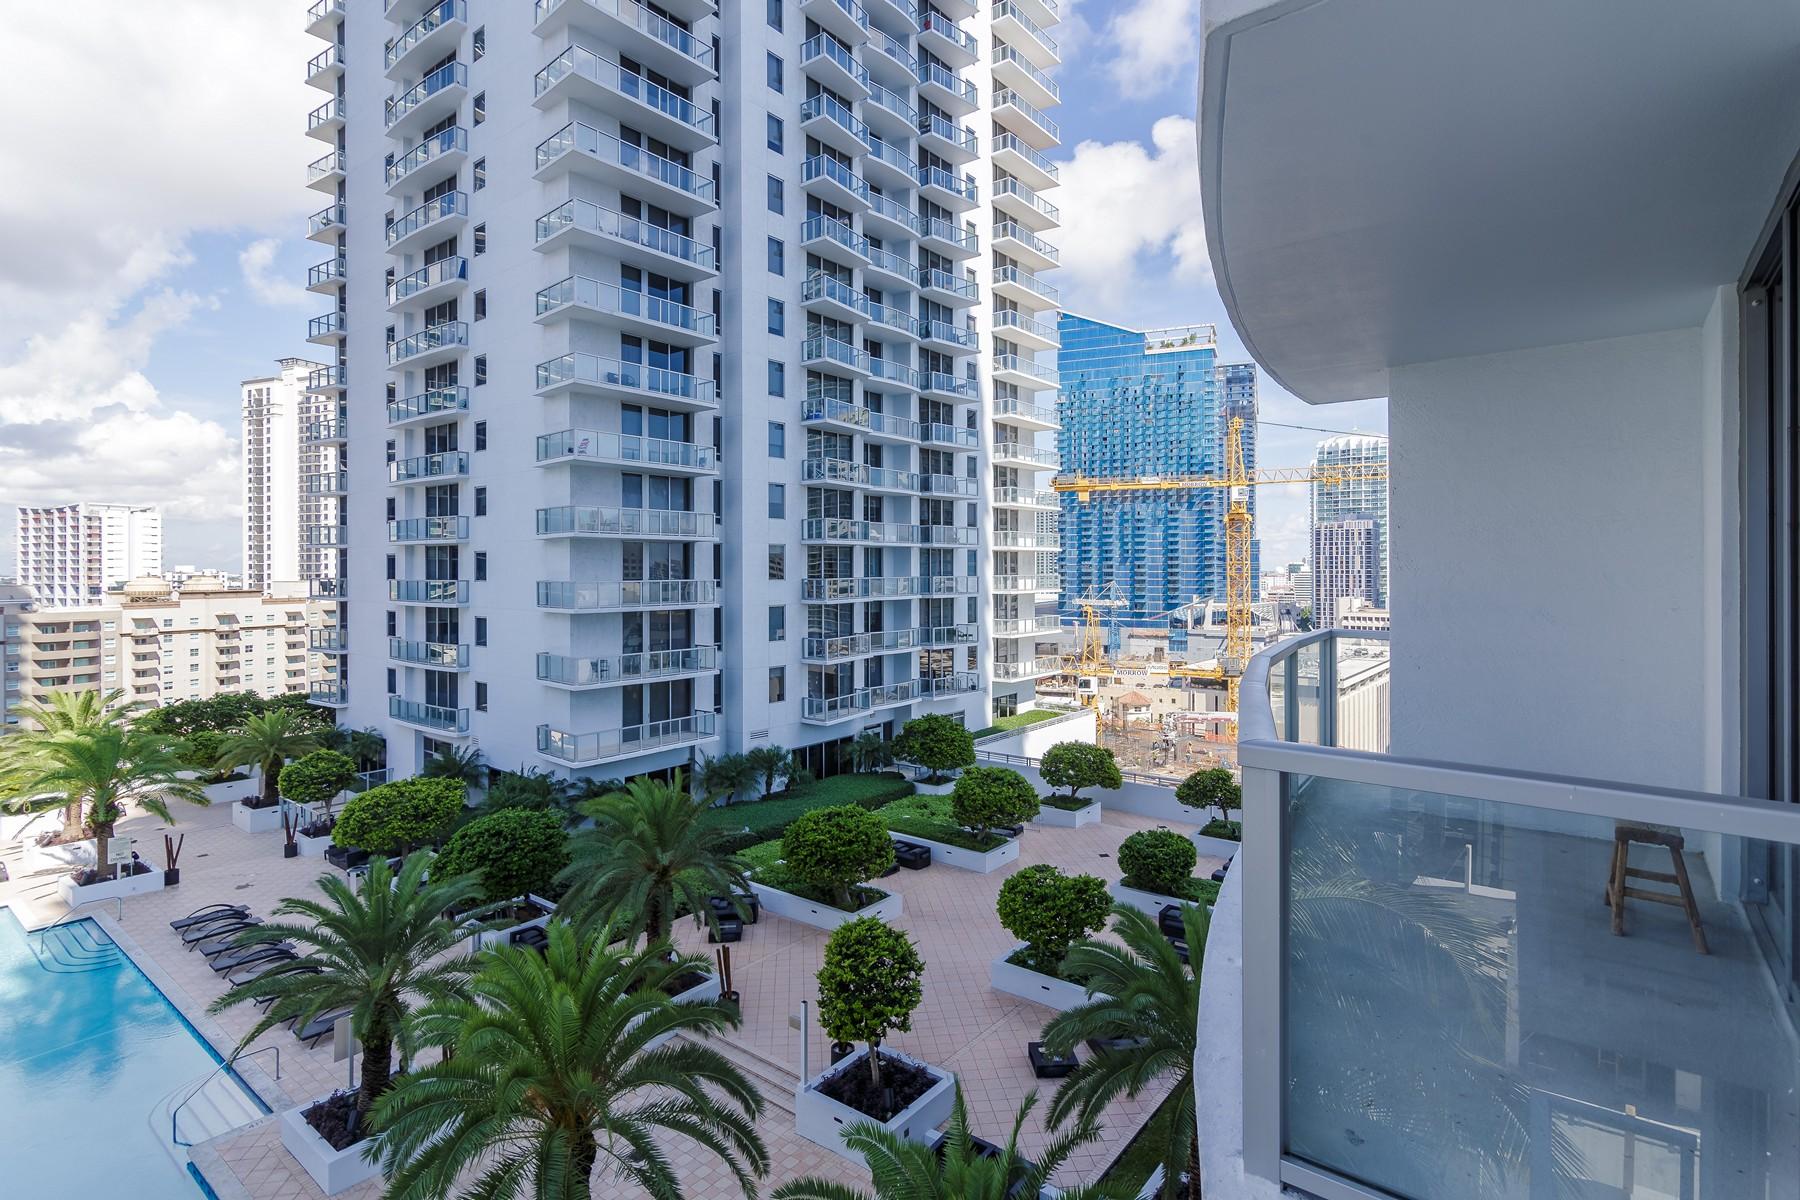 Condominium for Sale at 1060 Brickell Ave 1611 1060 Brickell Ave #1611 Miami, Florida 33131 United States